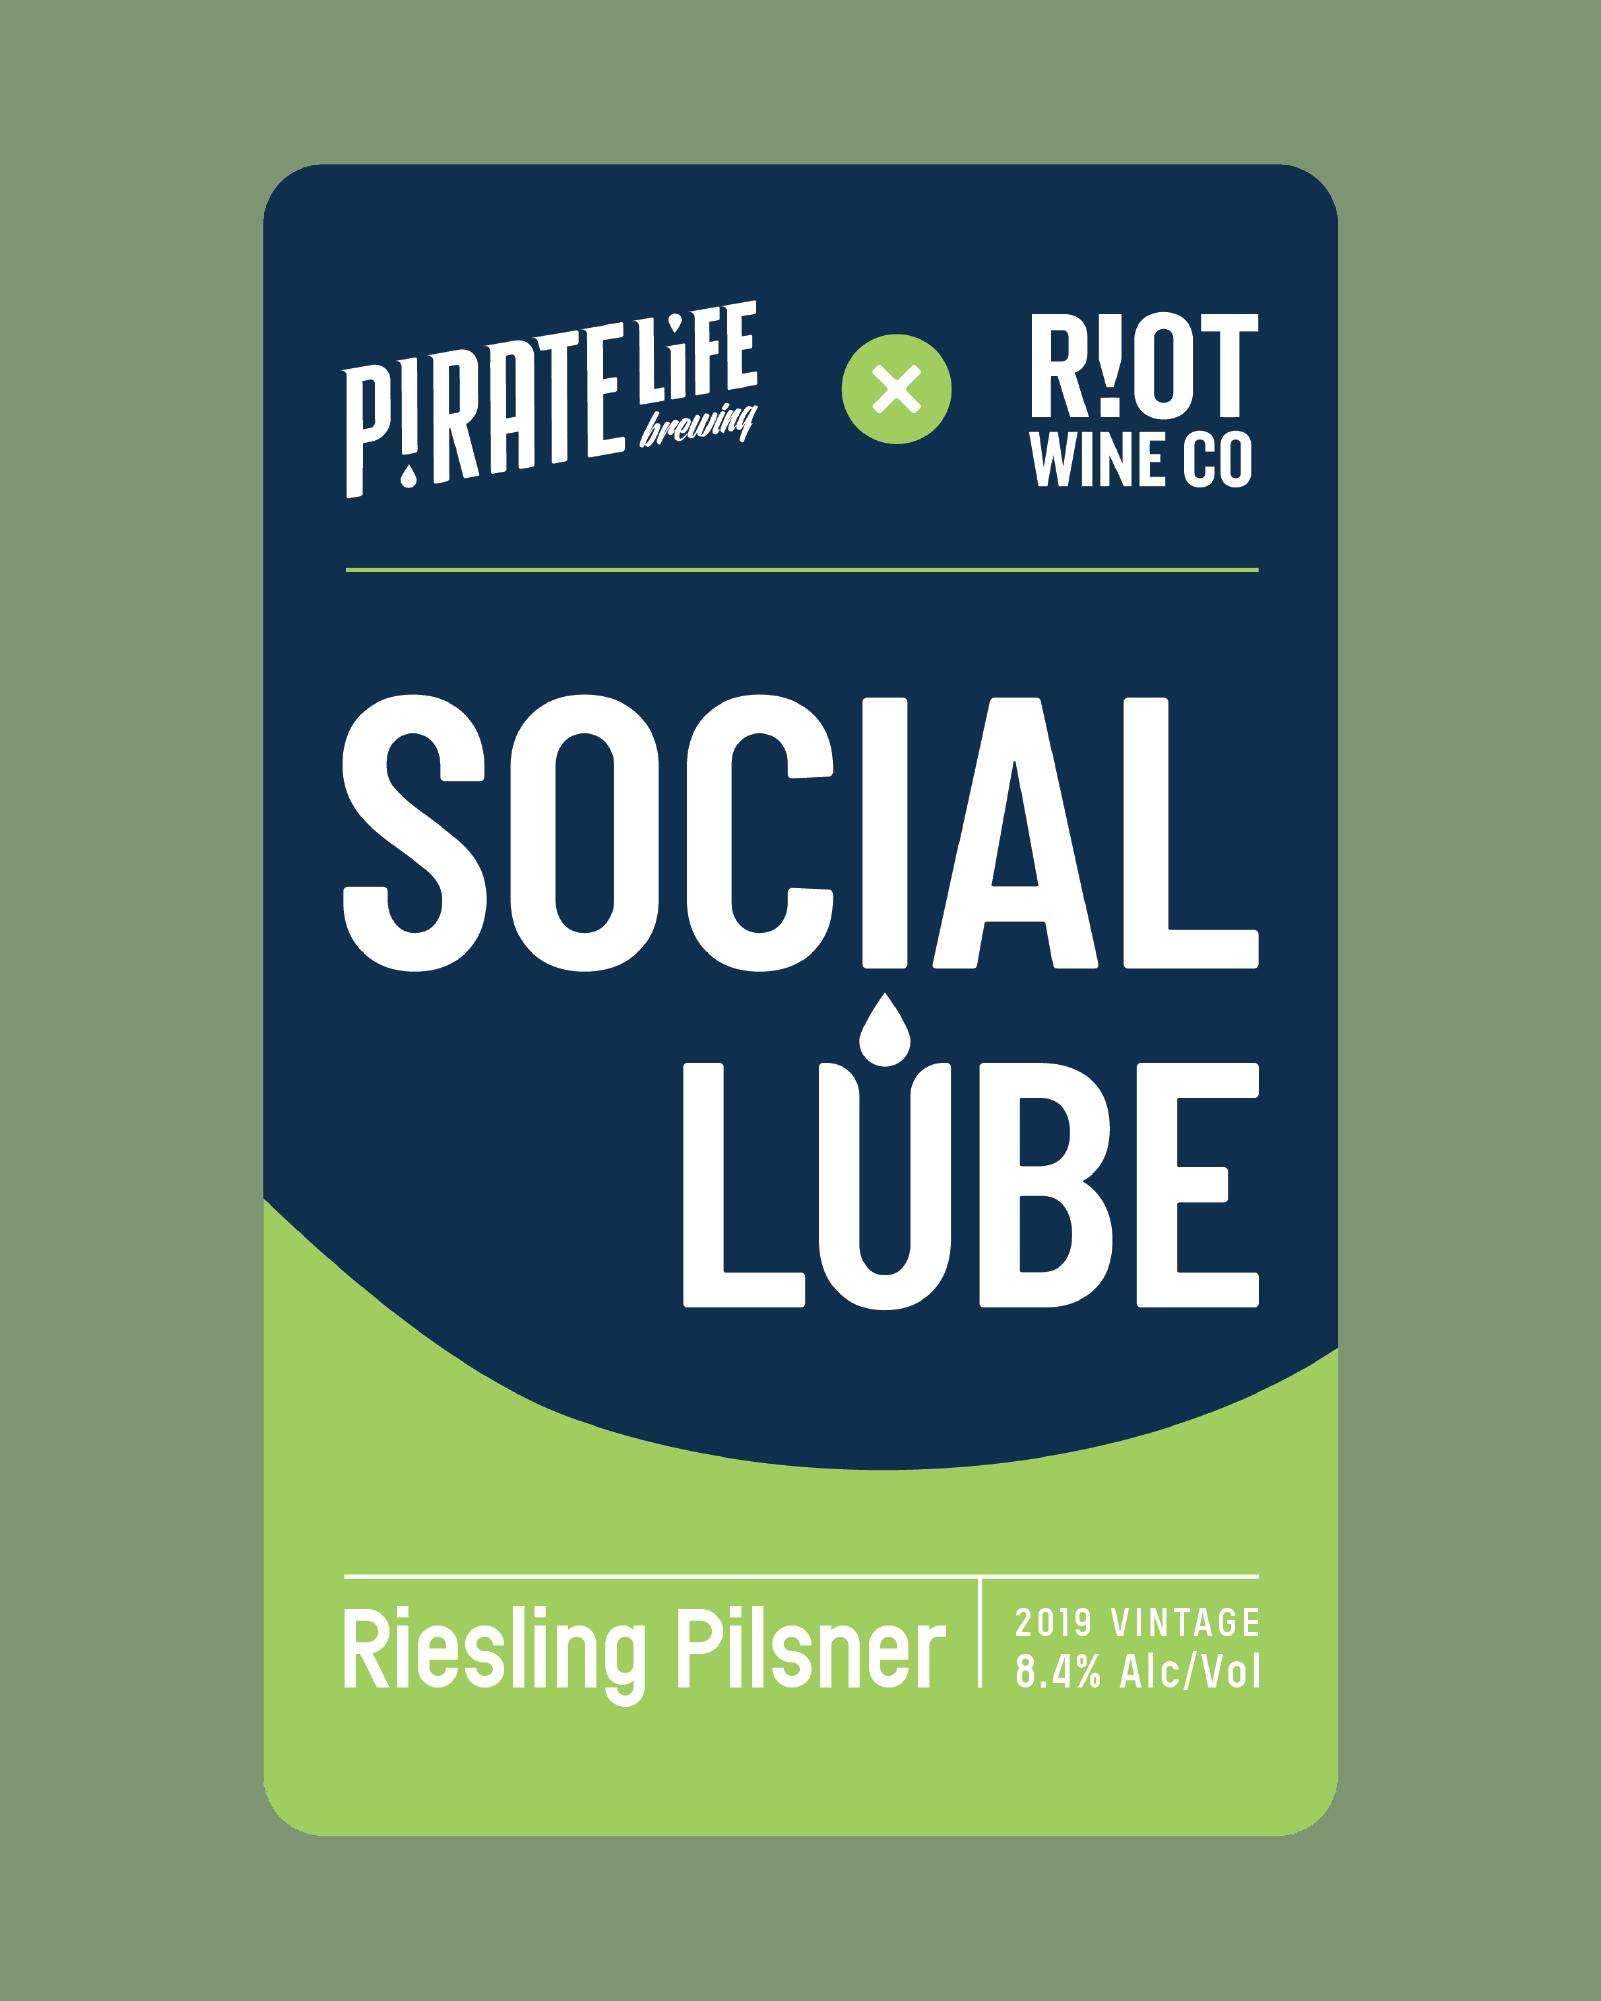 Social_Lube-02